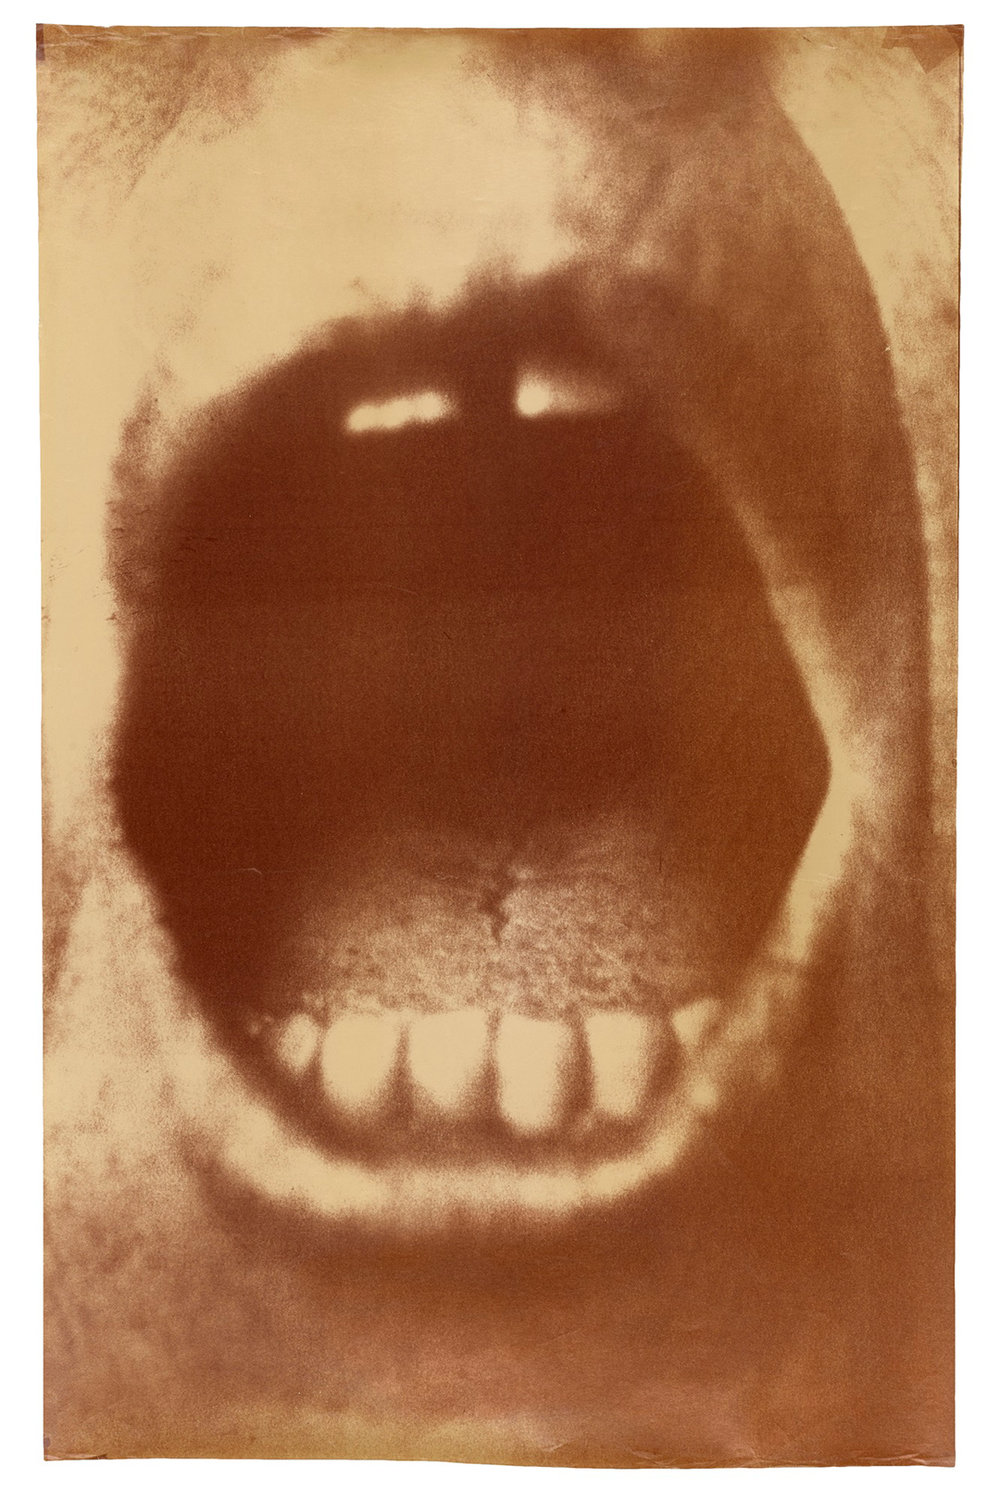 giant screaming mouth.jpg